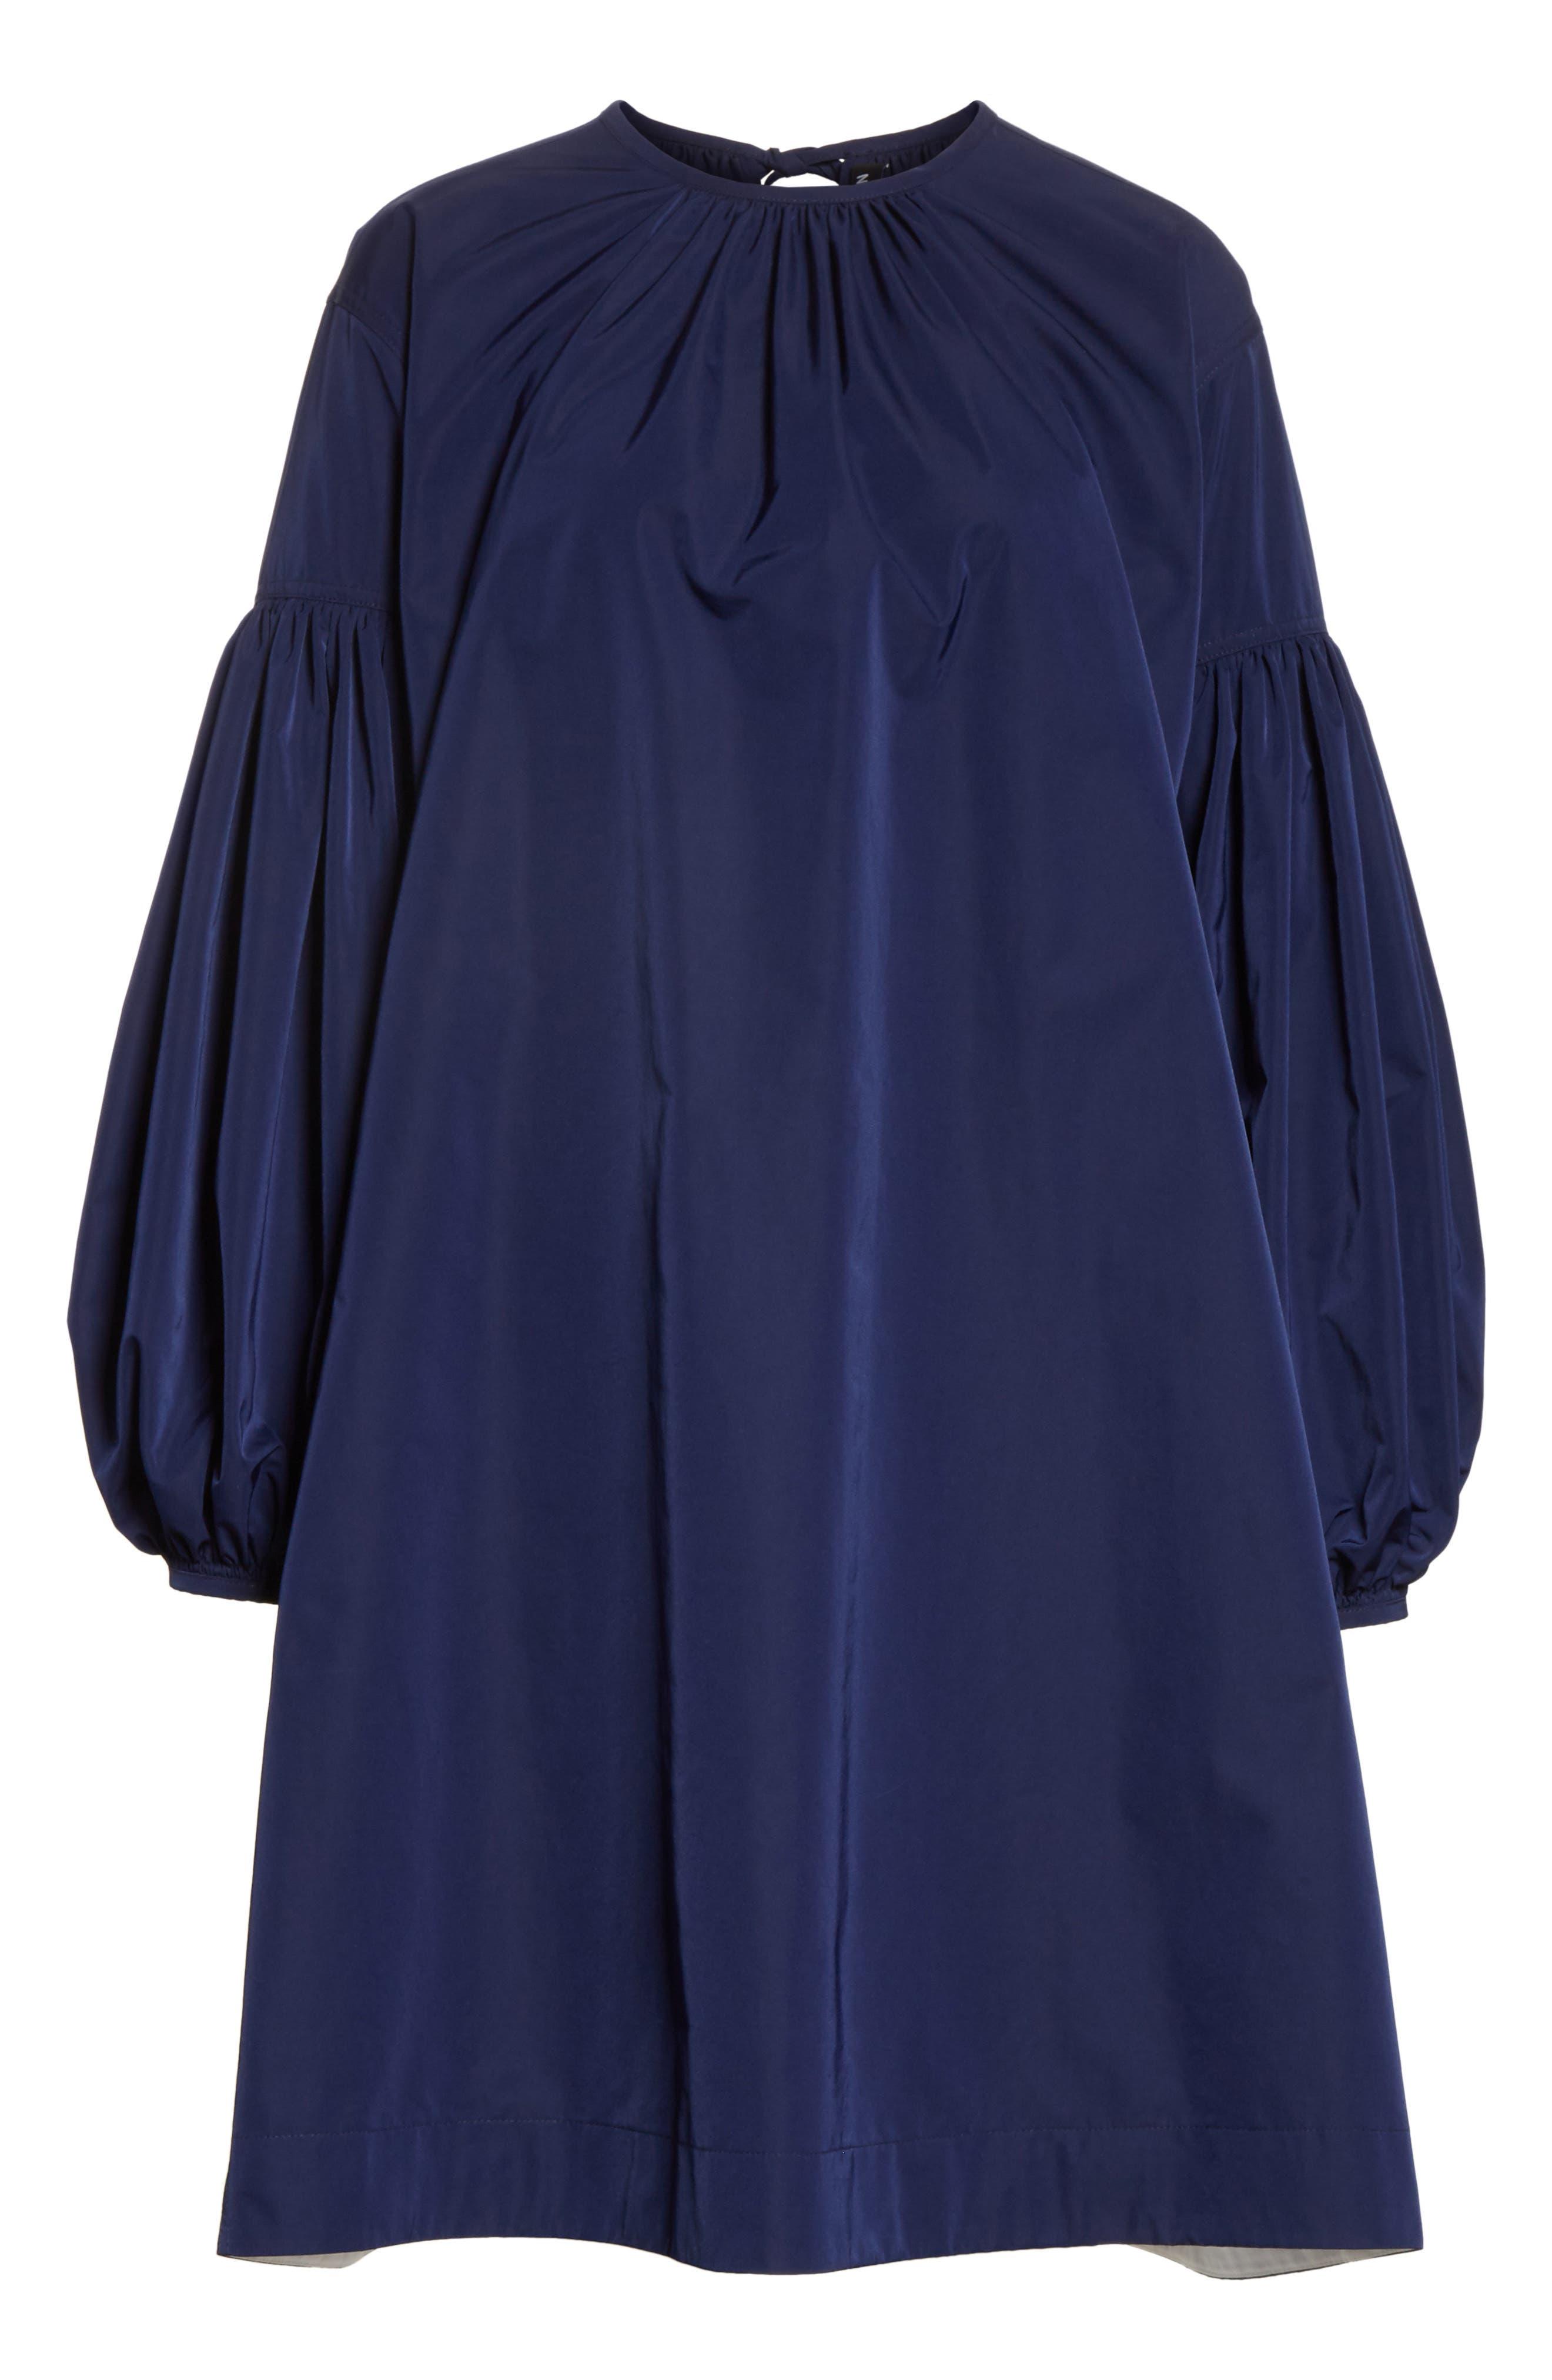 Ruched Sleeve Taffeta Dress,                             Alternate thumbnail 6, color,                             404